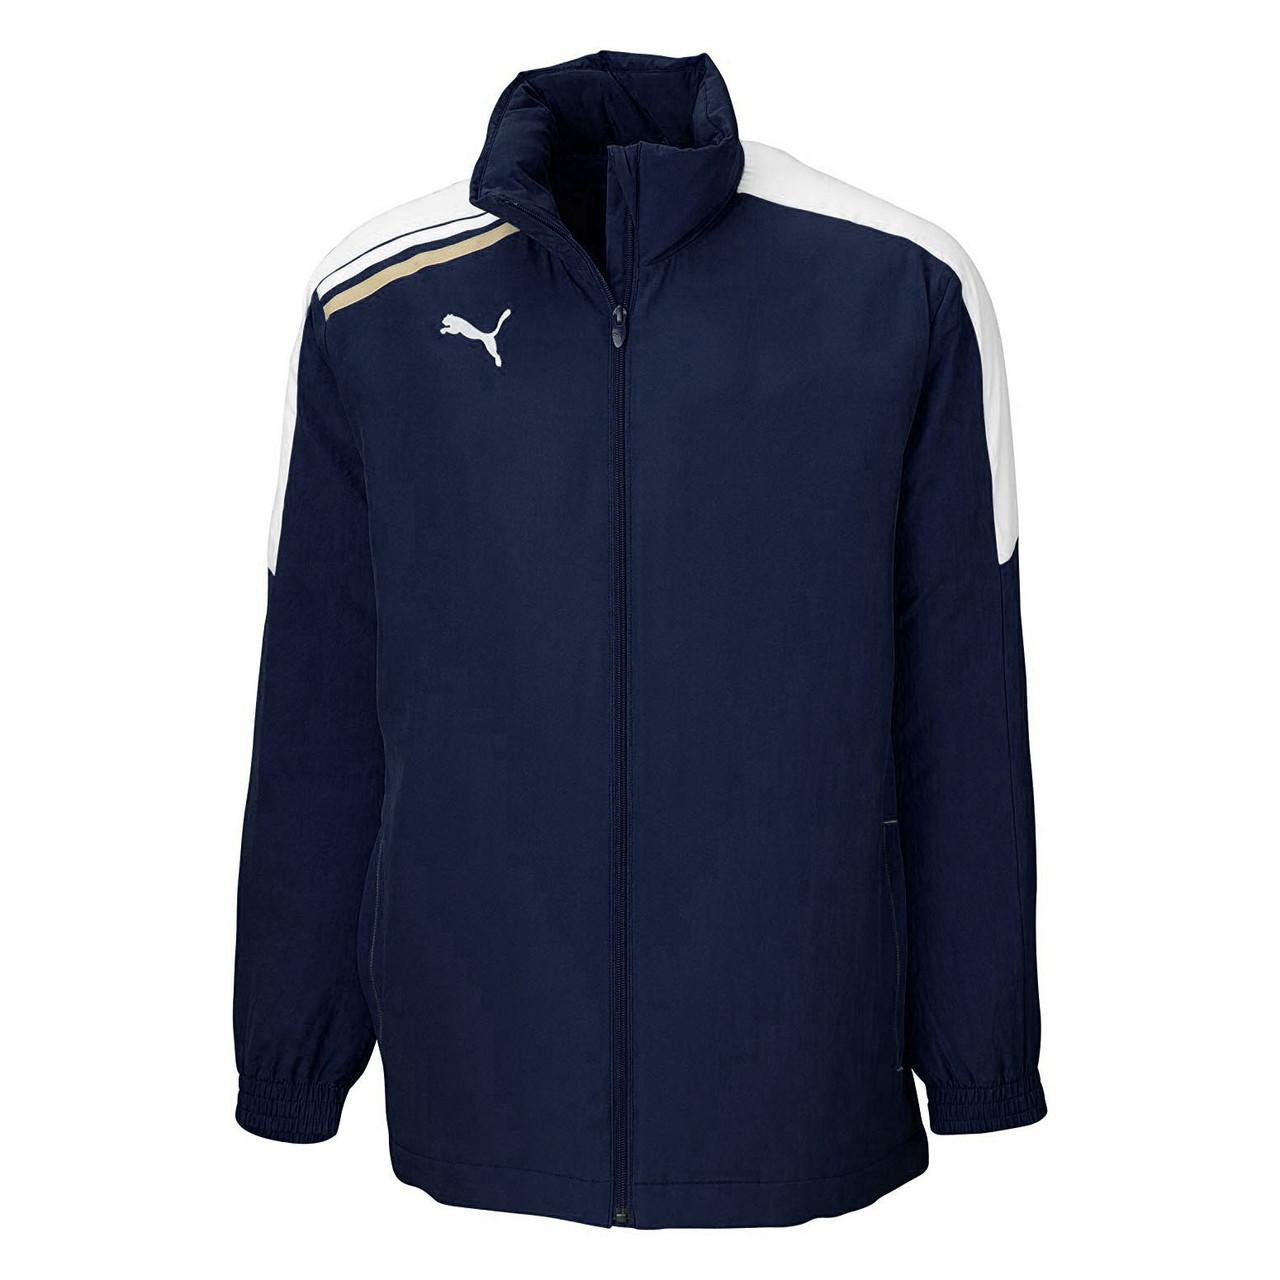 Куртка Puma Esito Stadium Jacket 652602 XL Navy